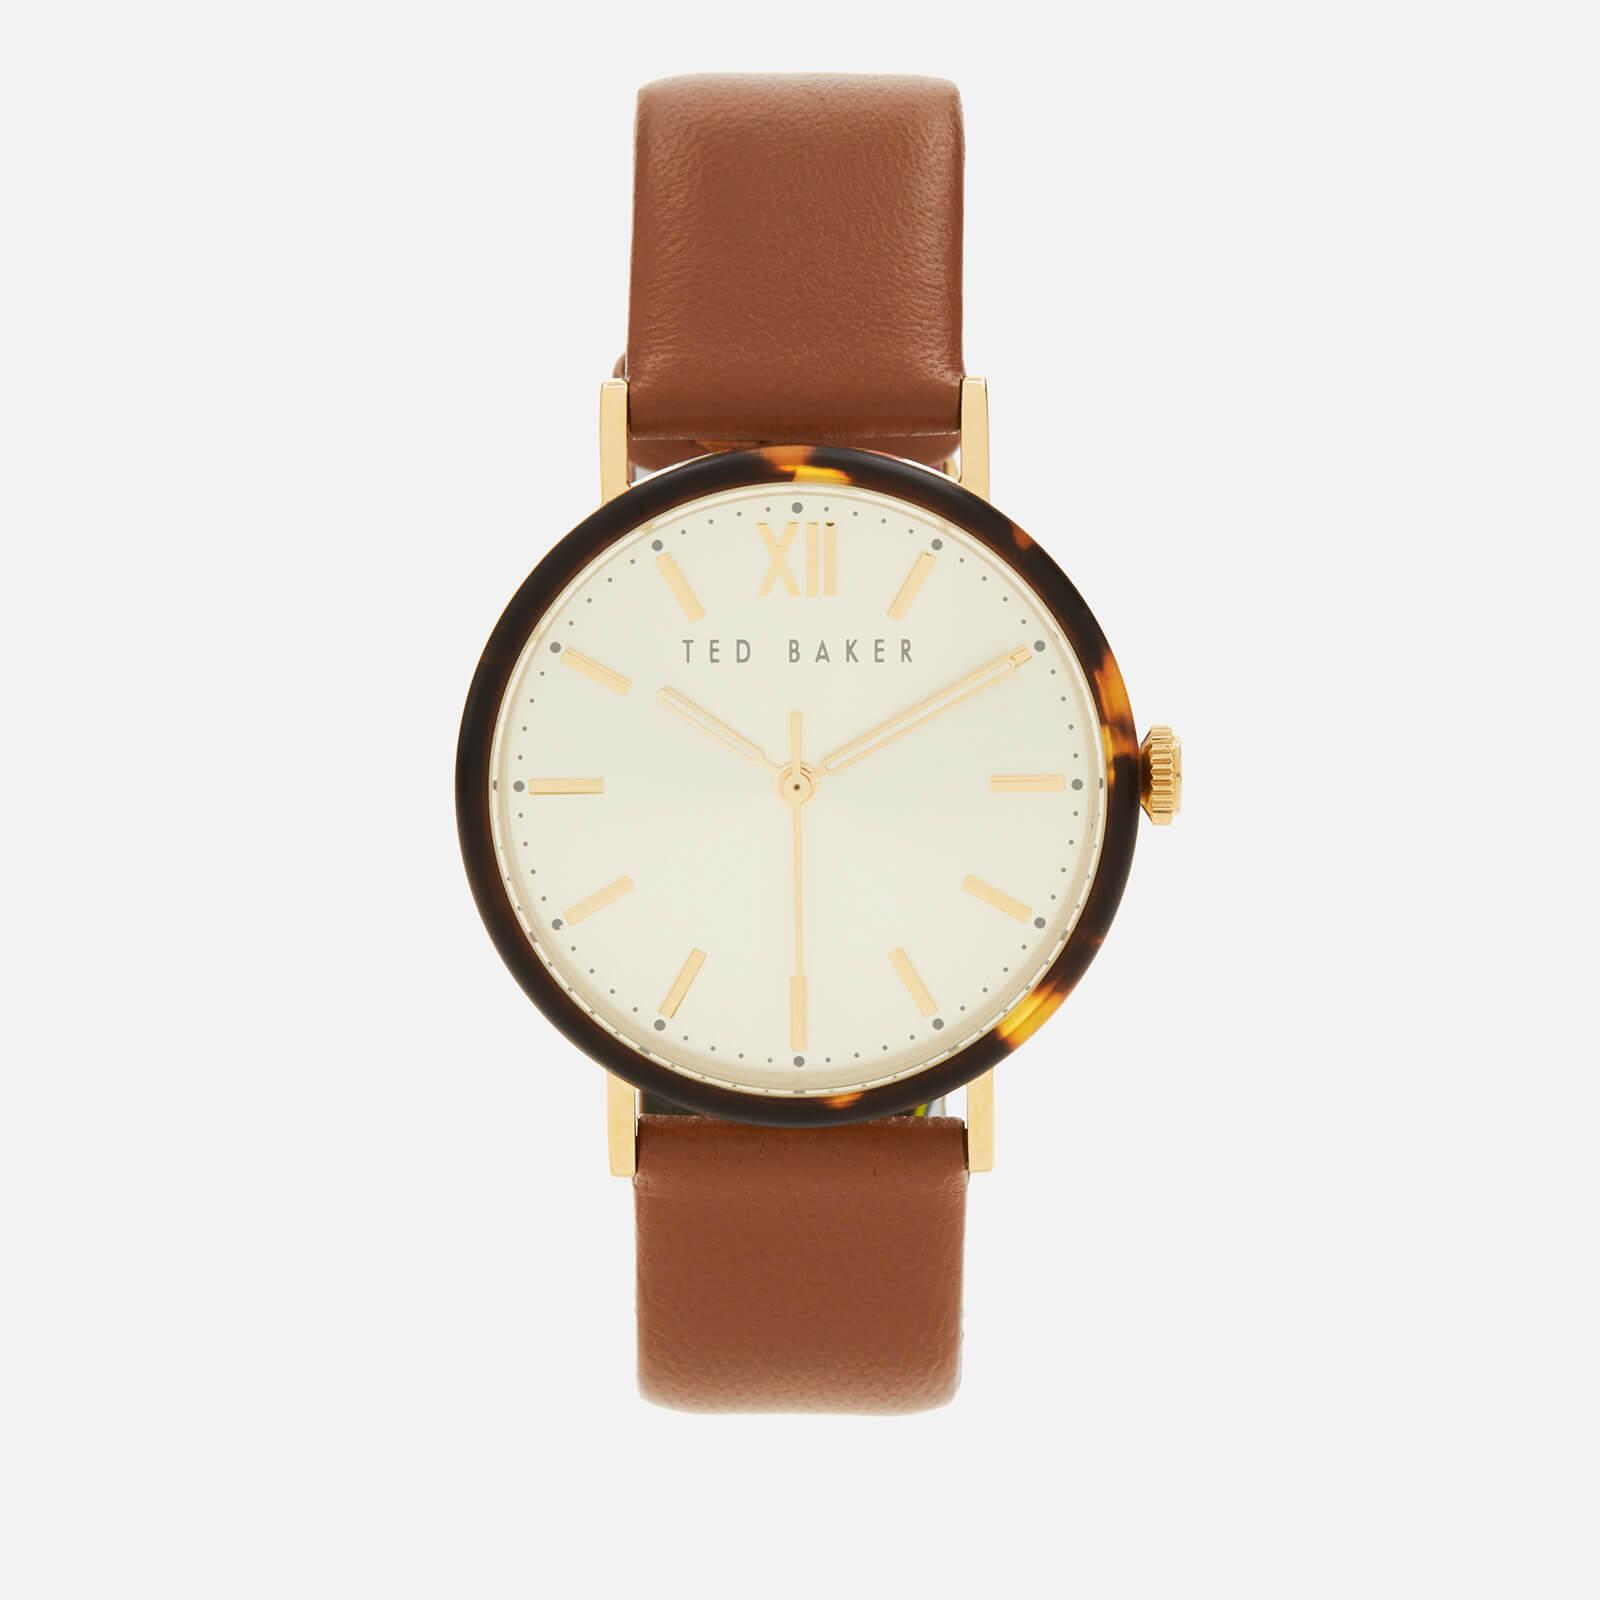 Ted Baker Women's Phylipa Watch - Tan